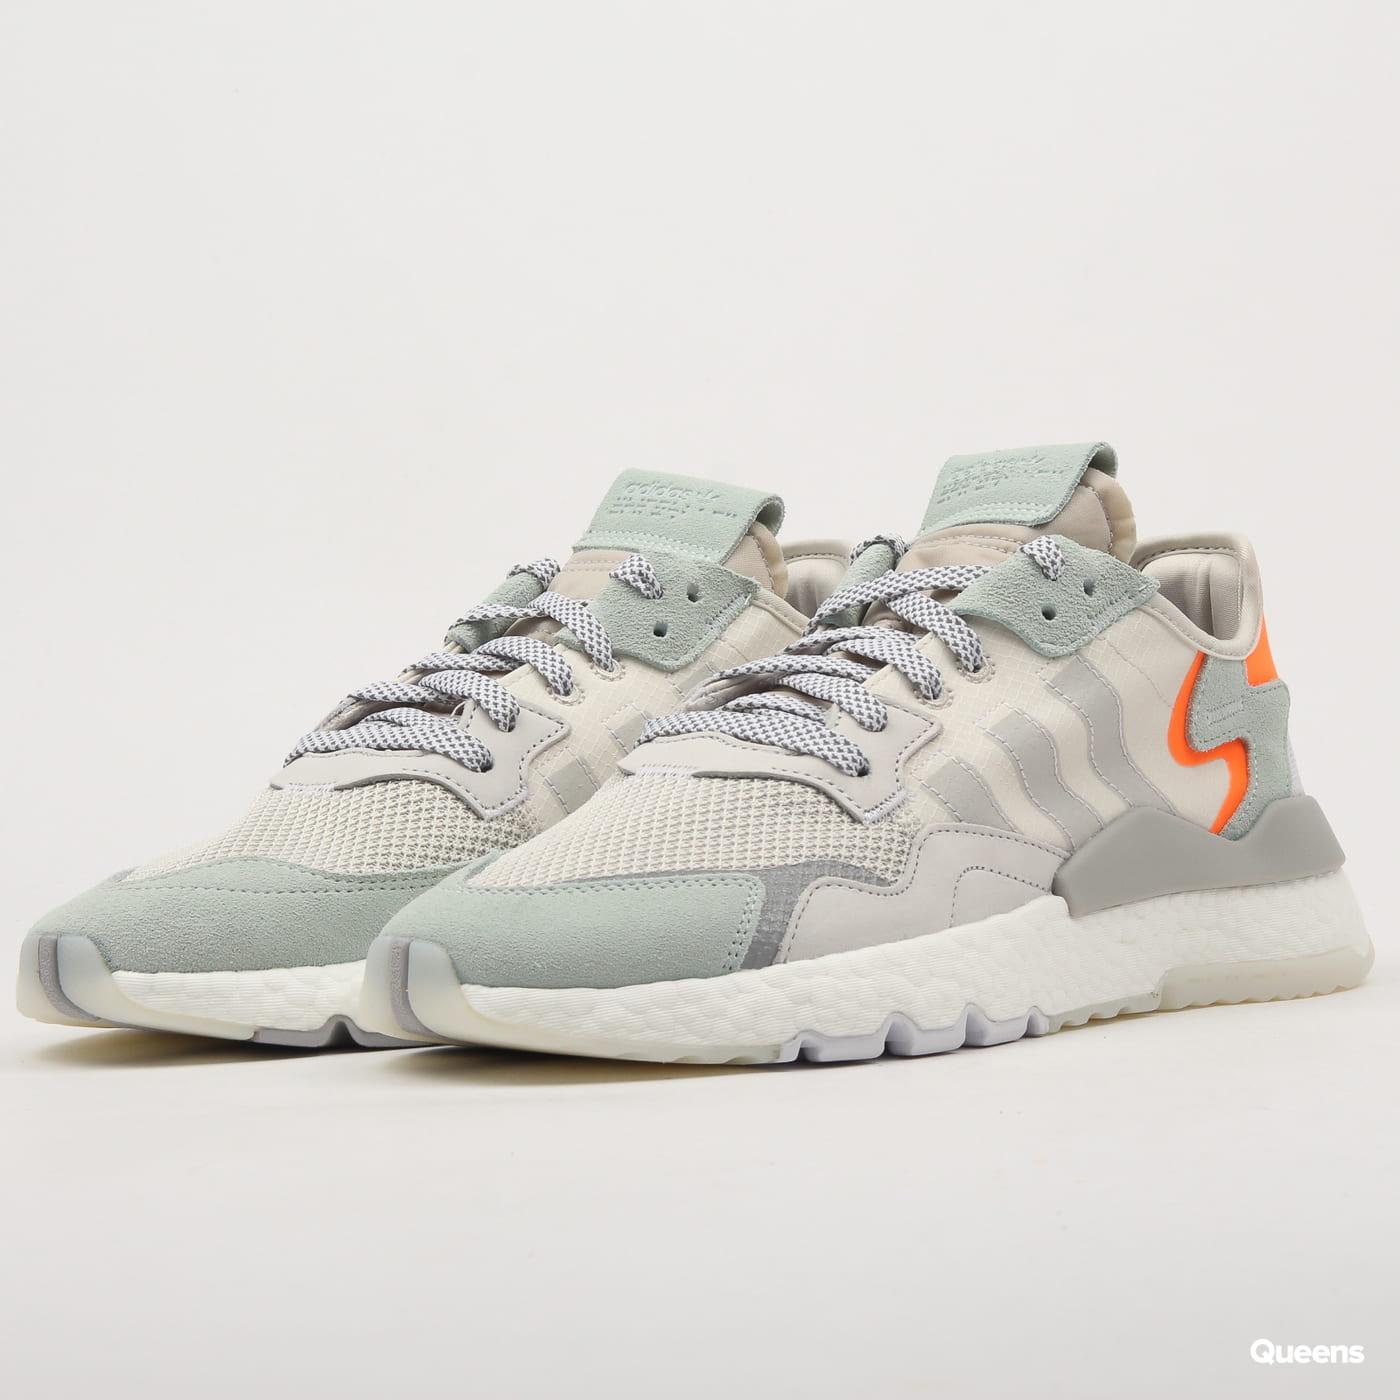 Jogger adidas Originals rawwht Nite vapgrn greone 9eEYWDH2I